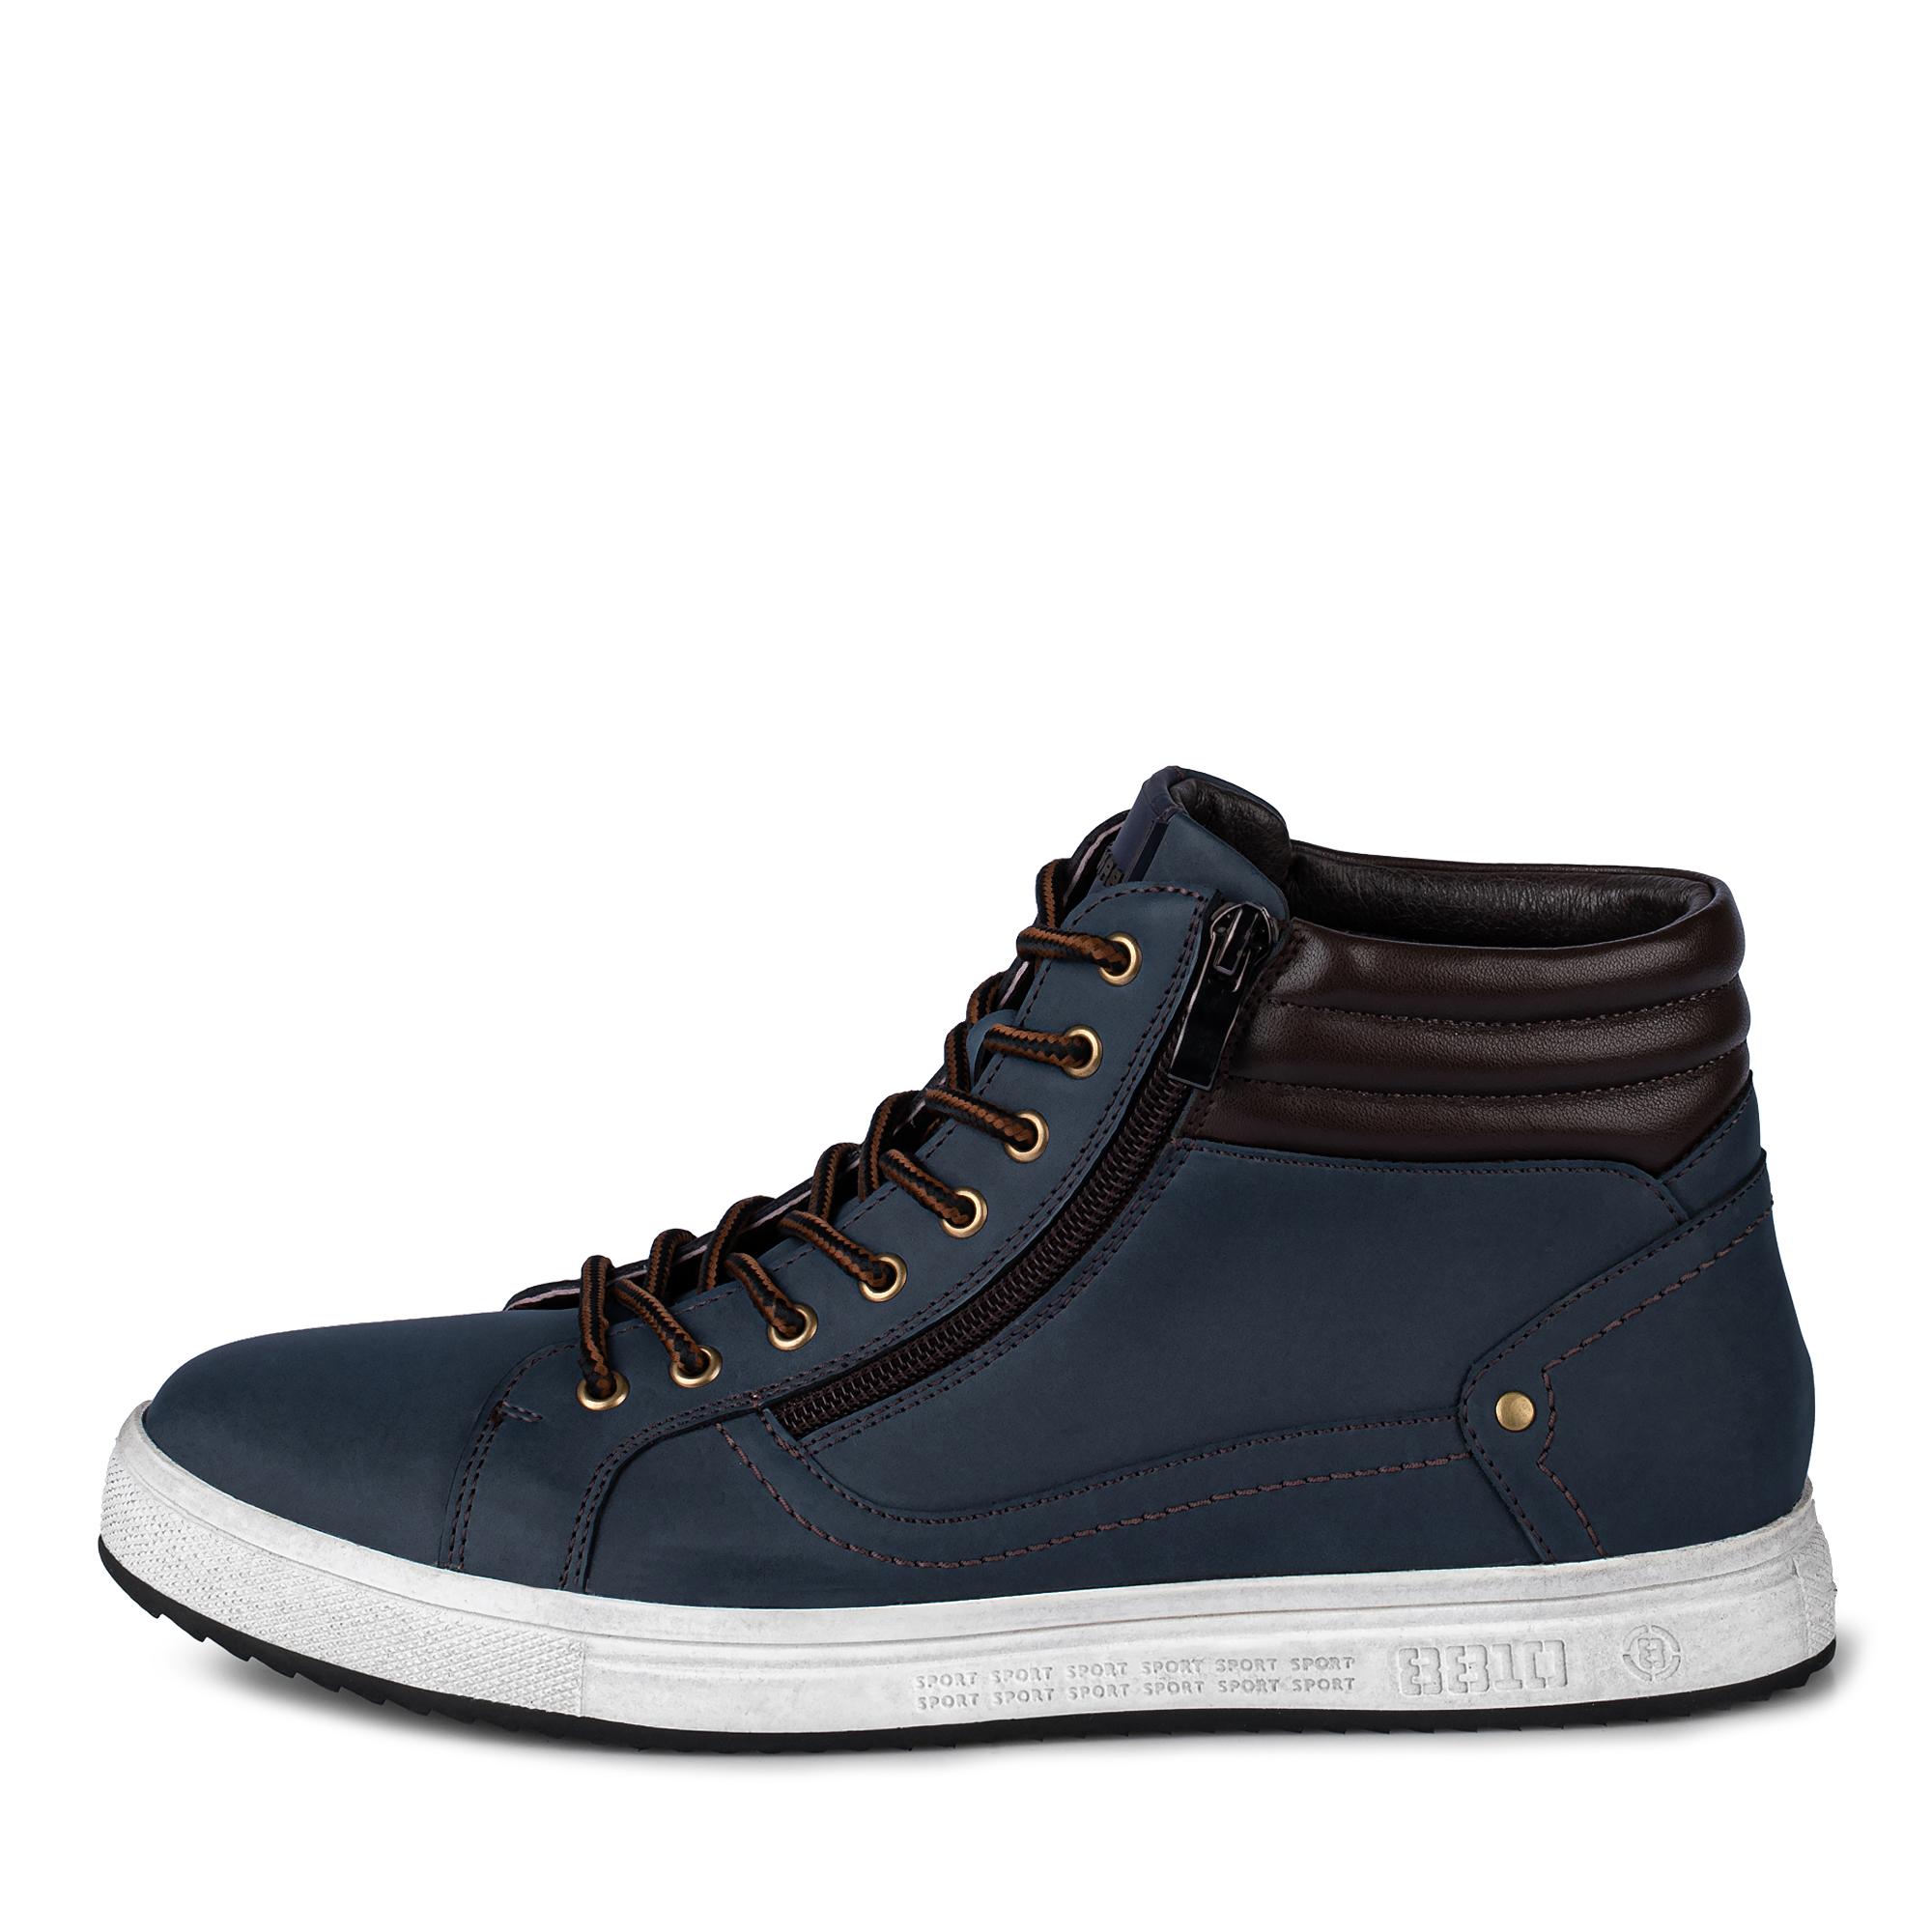 Ботинки BRIGGS 104-525A-2603